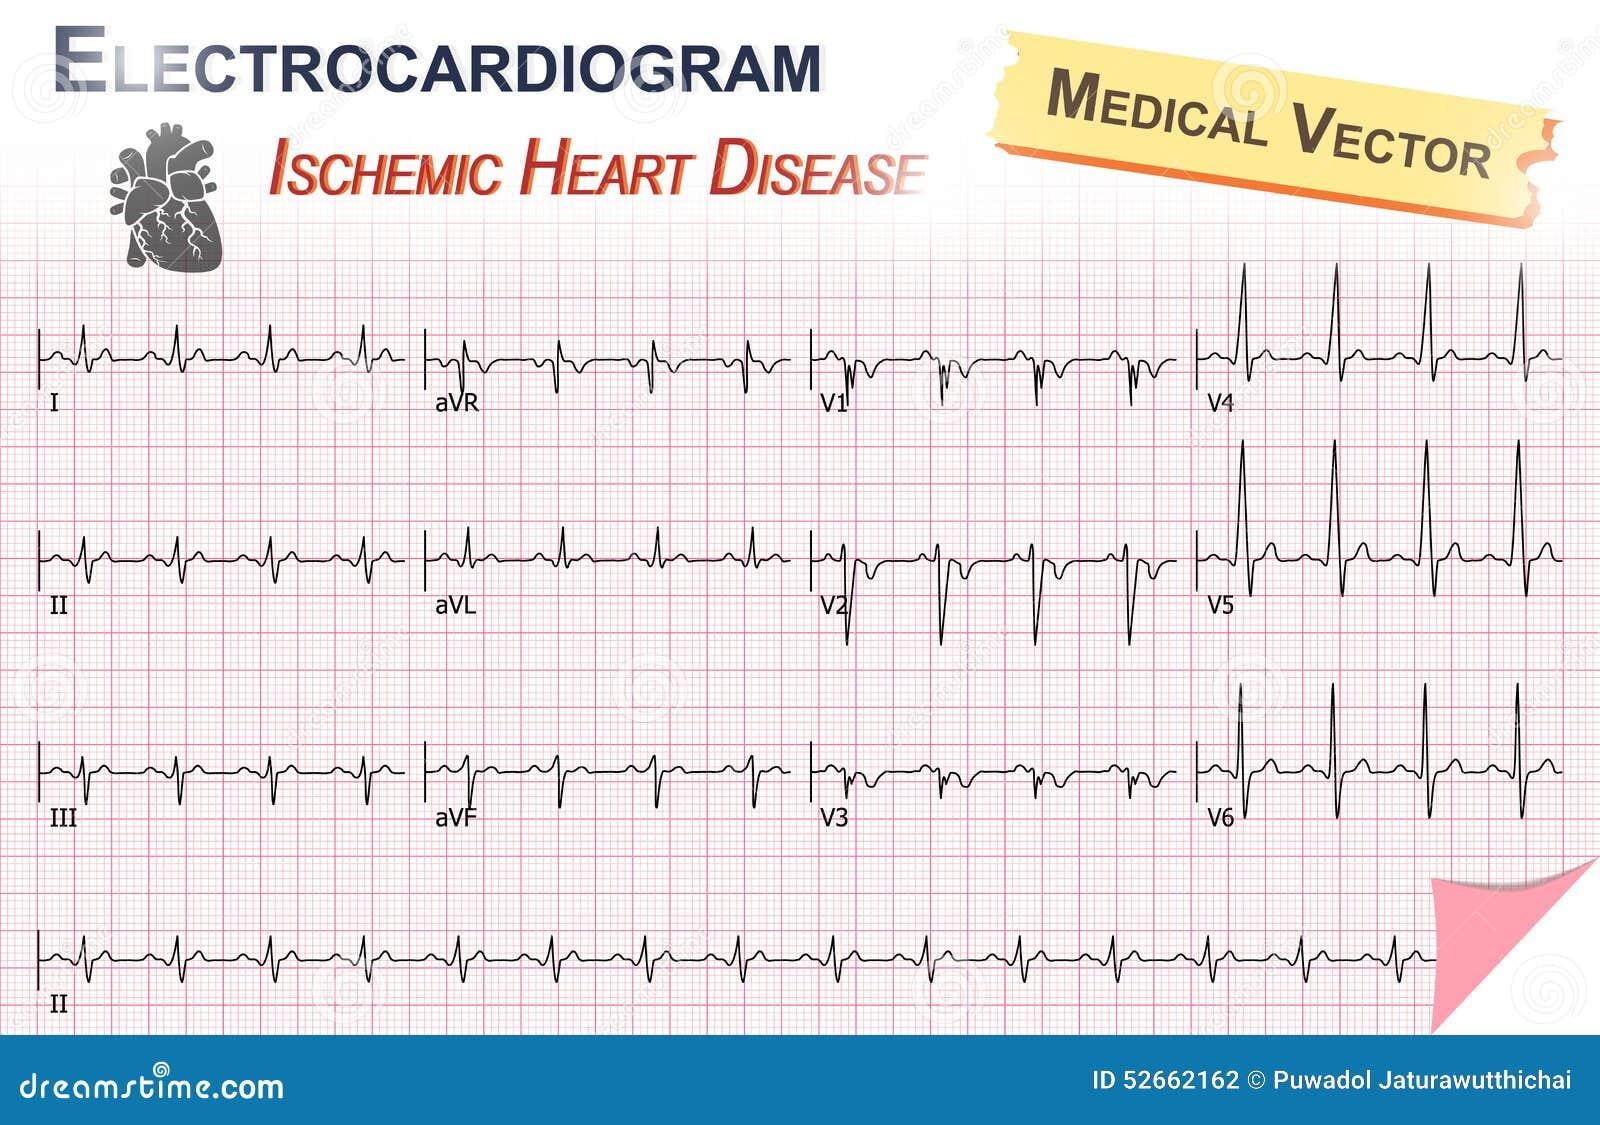 essay on myocardial infarction